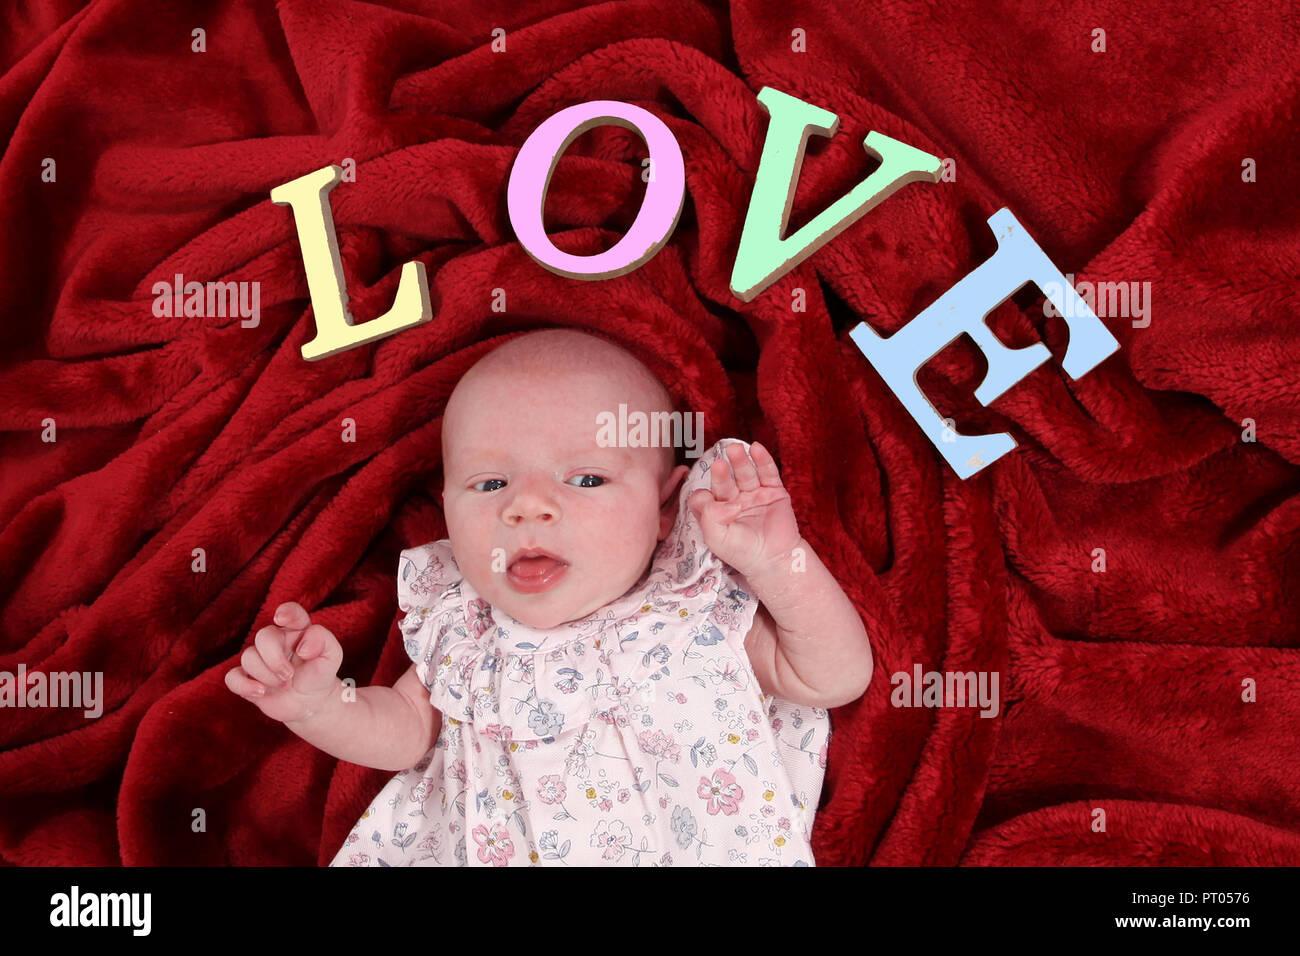 new born baby girl - Stock Image